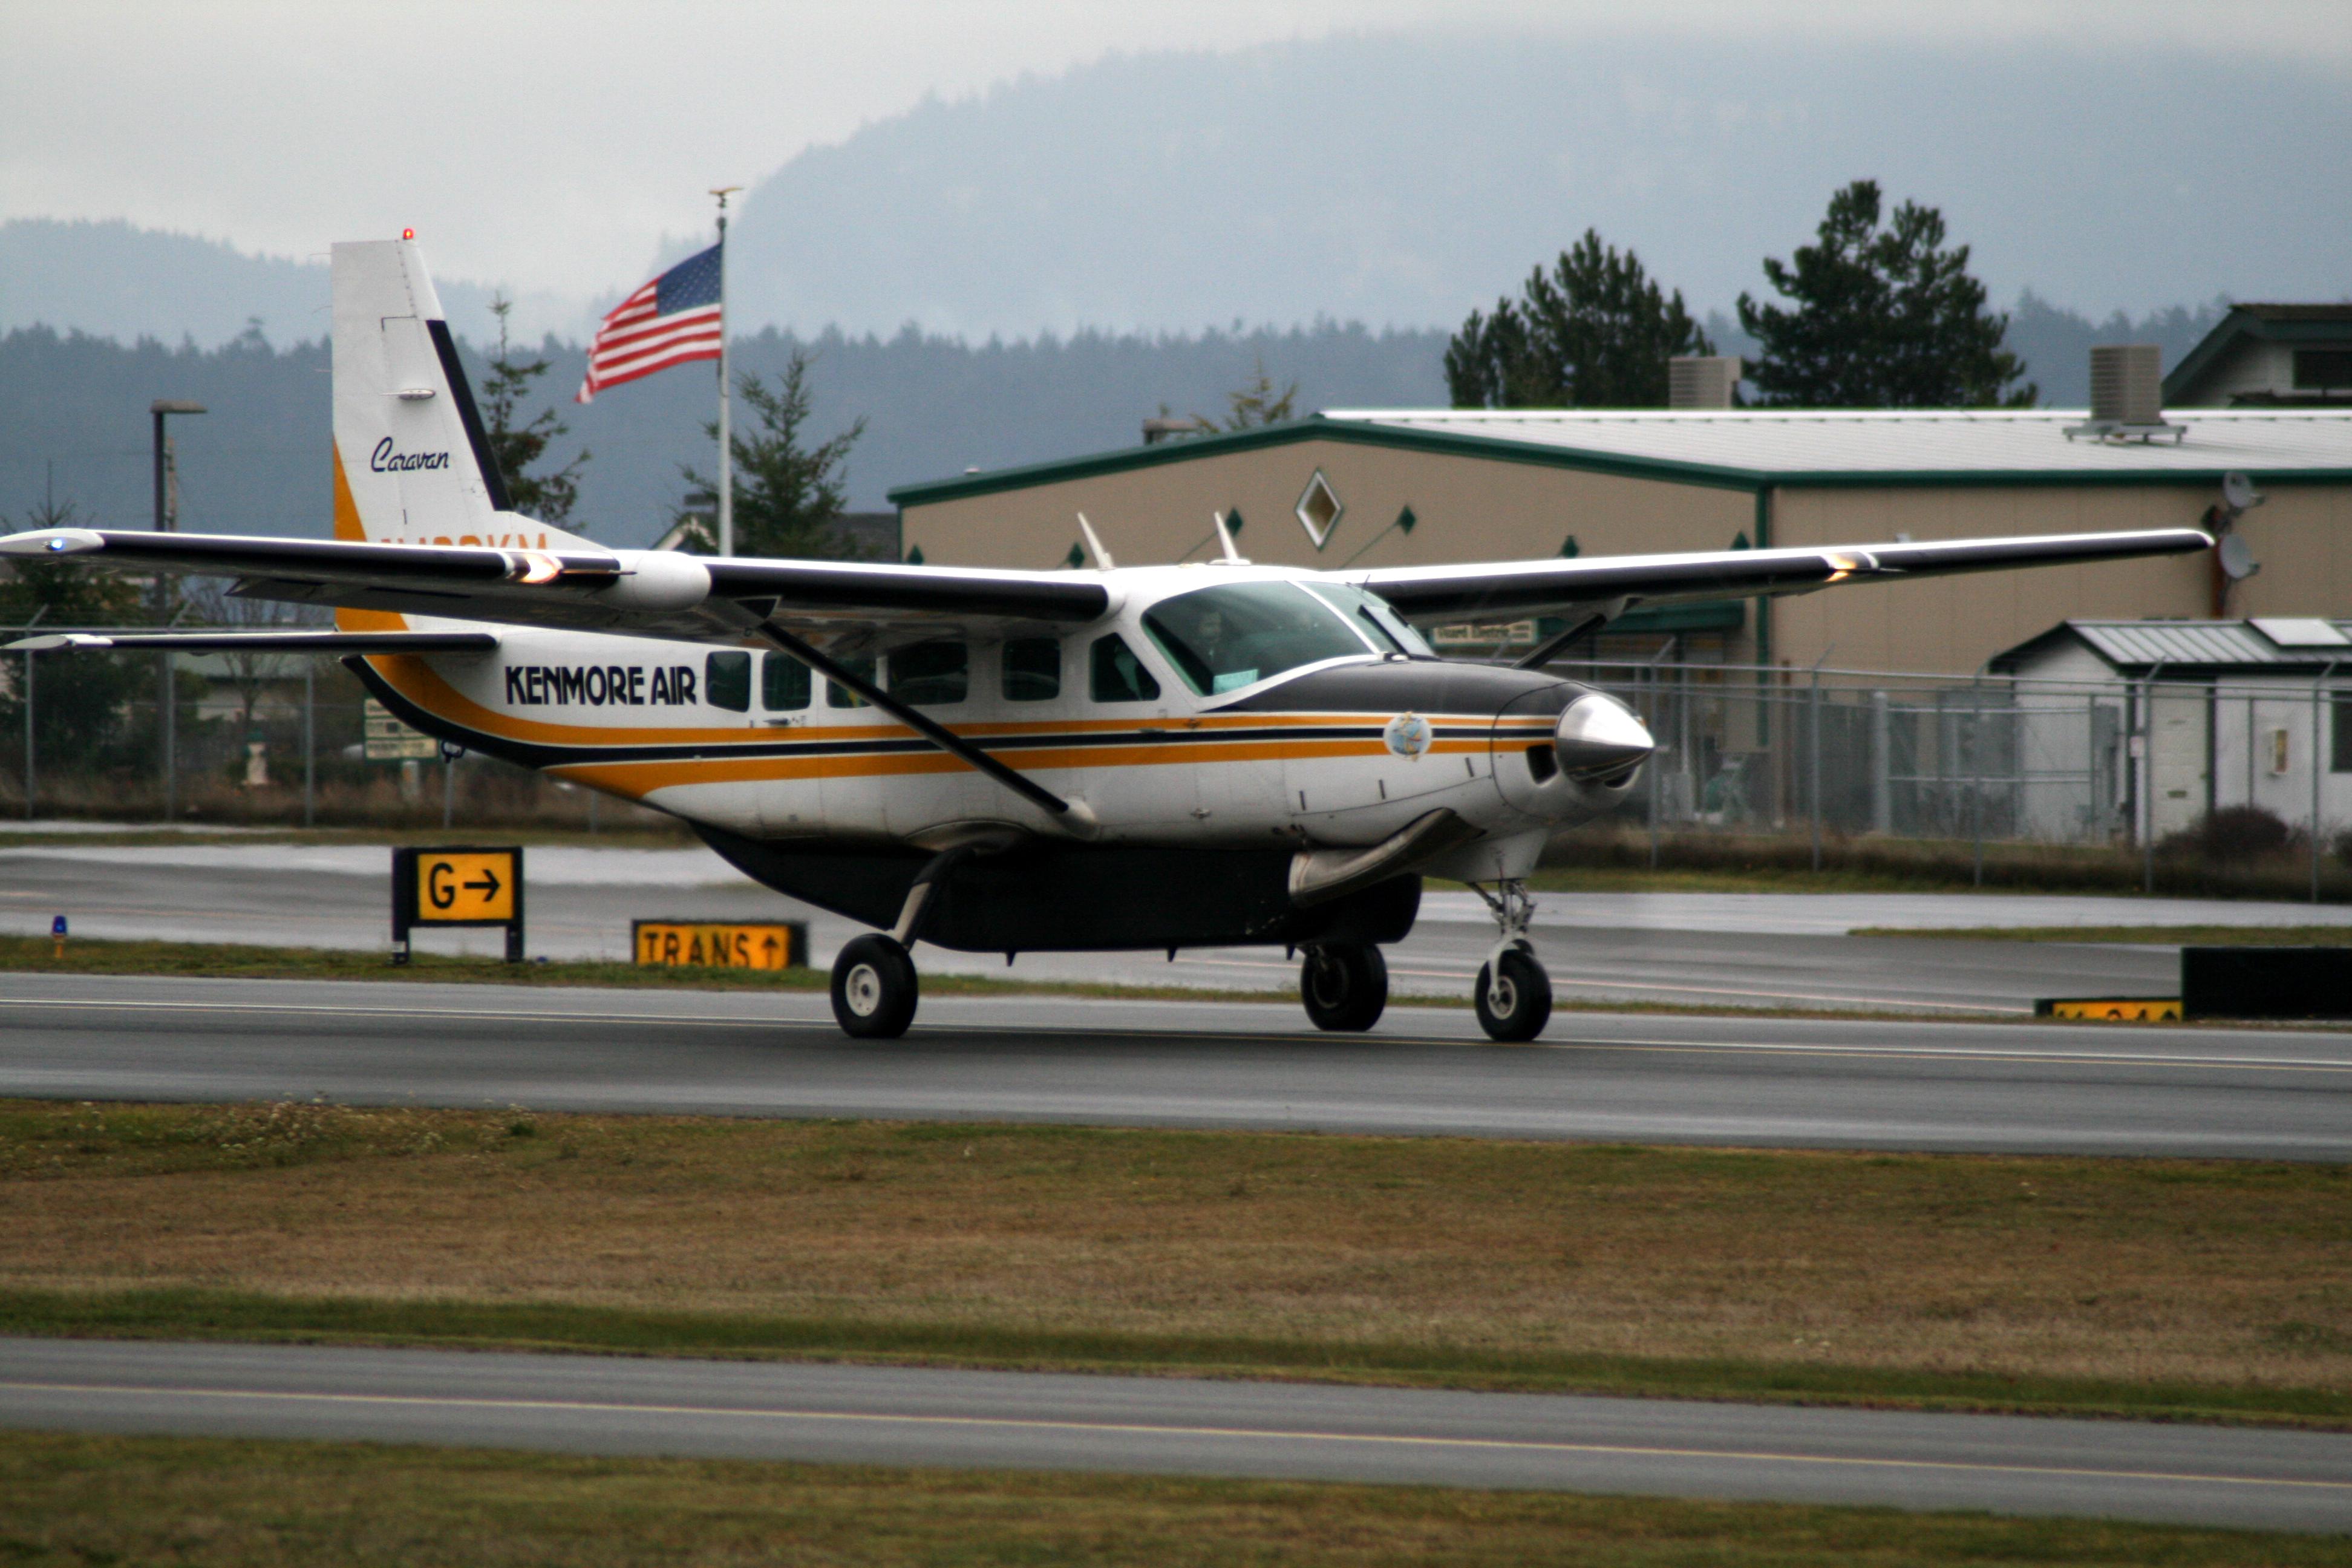 Cessna%20light%20aircraft%20-%20single%20turboprop%20engine